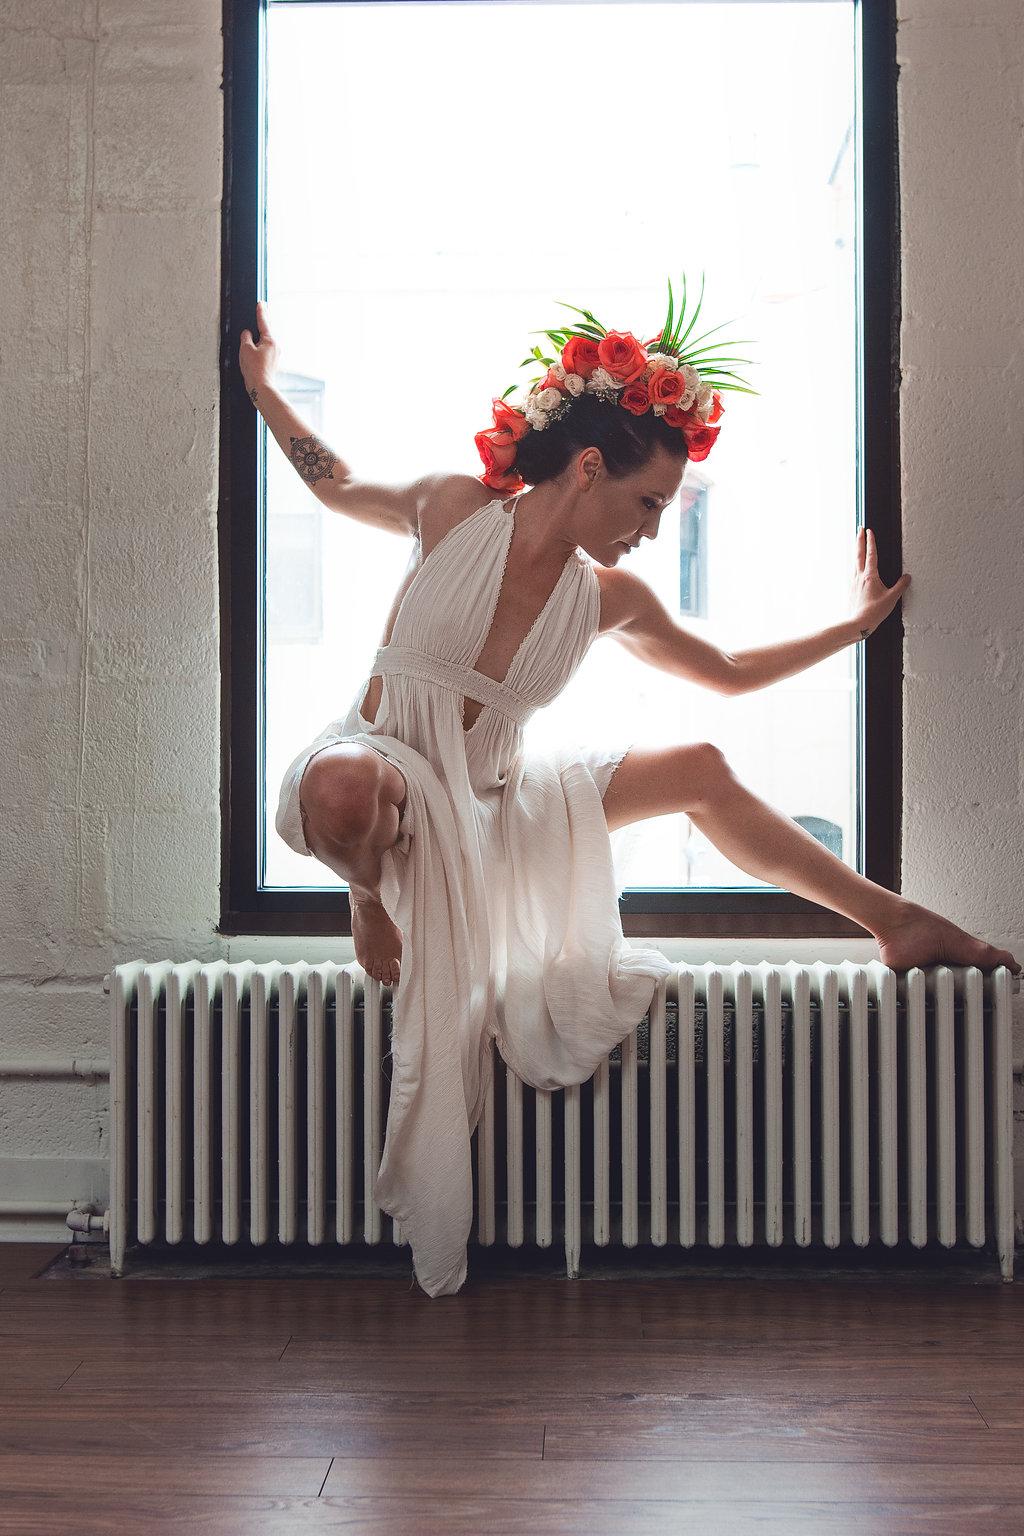 Lisa Rundall Wedding Photography Colorado model posing on wall heater